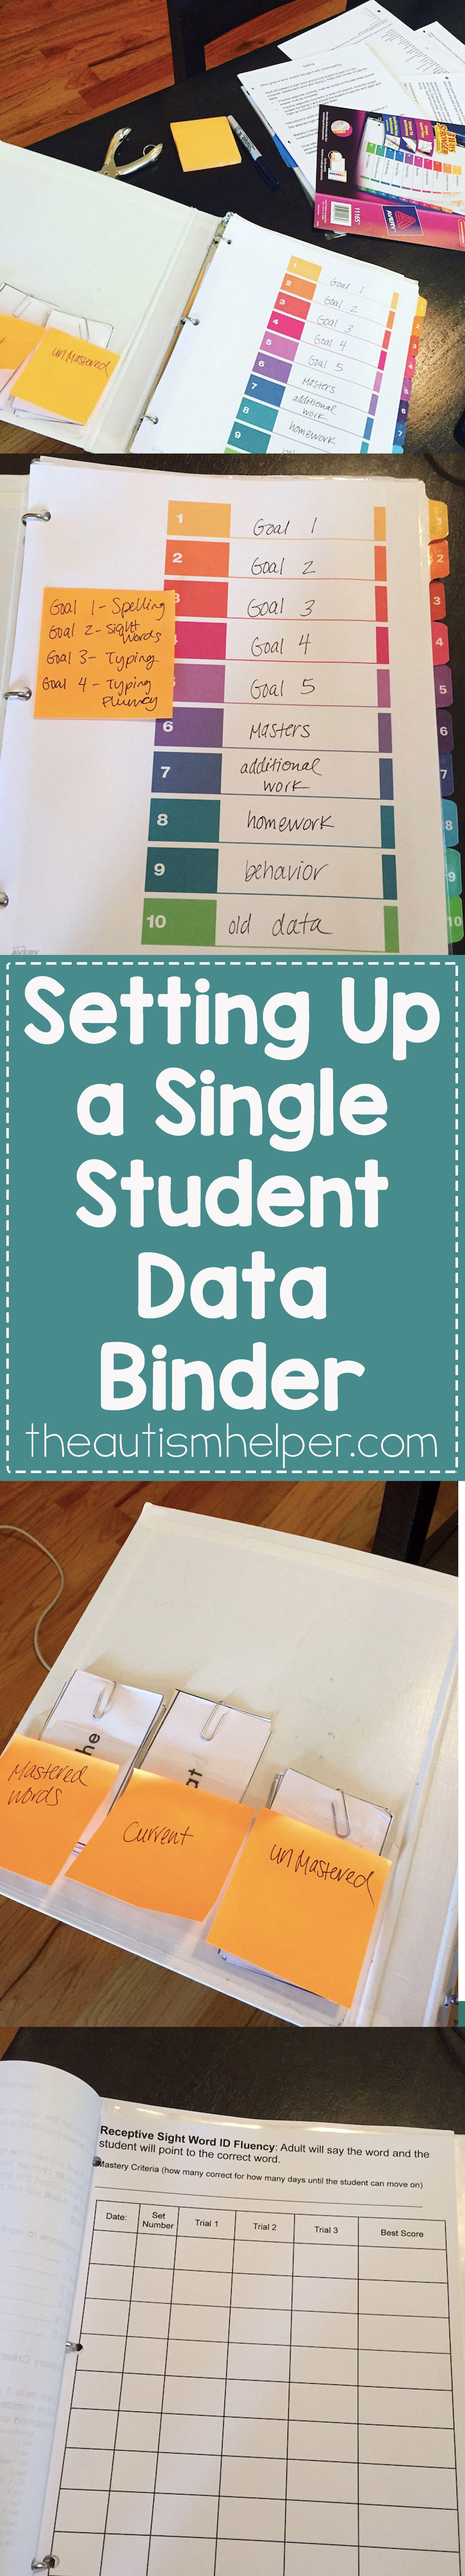 Setting Up a Single Student Data Binder | Segundo grado, Autismo y ...